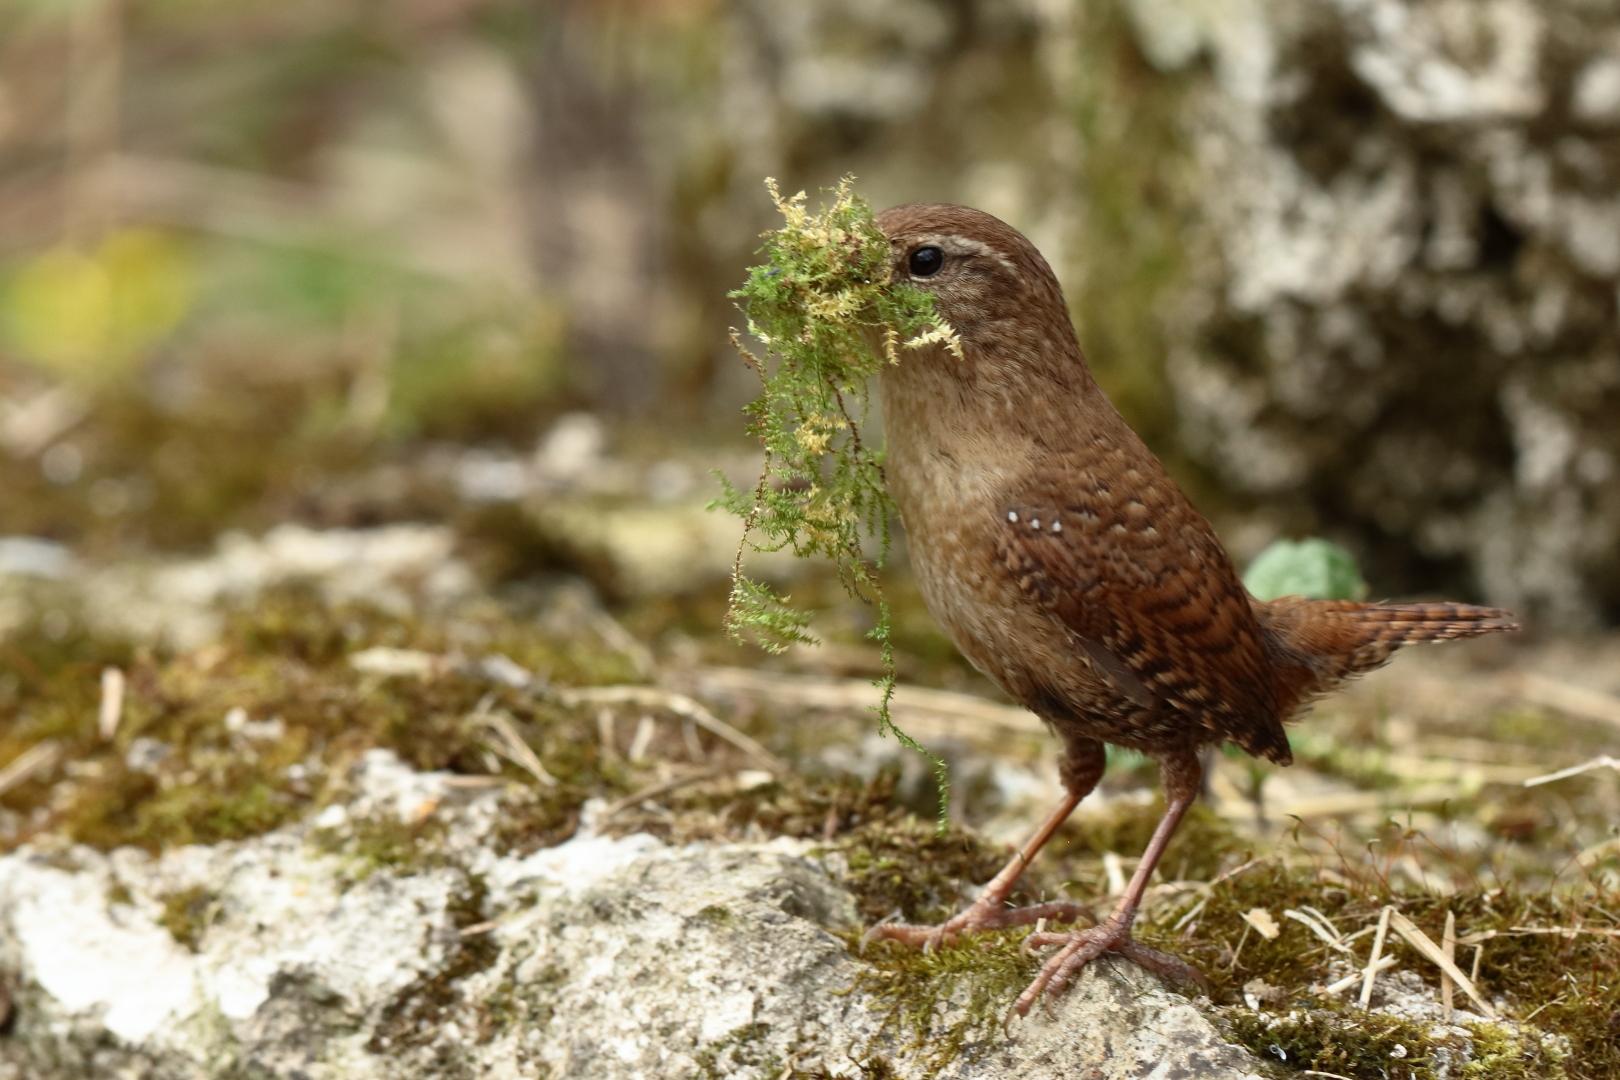 Zaunkonig Beim Nestbau Foto Bild Tiere Wildlife Wild Lebende